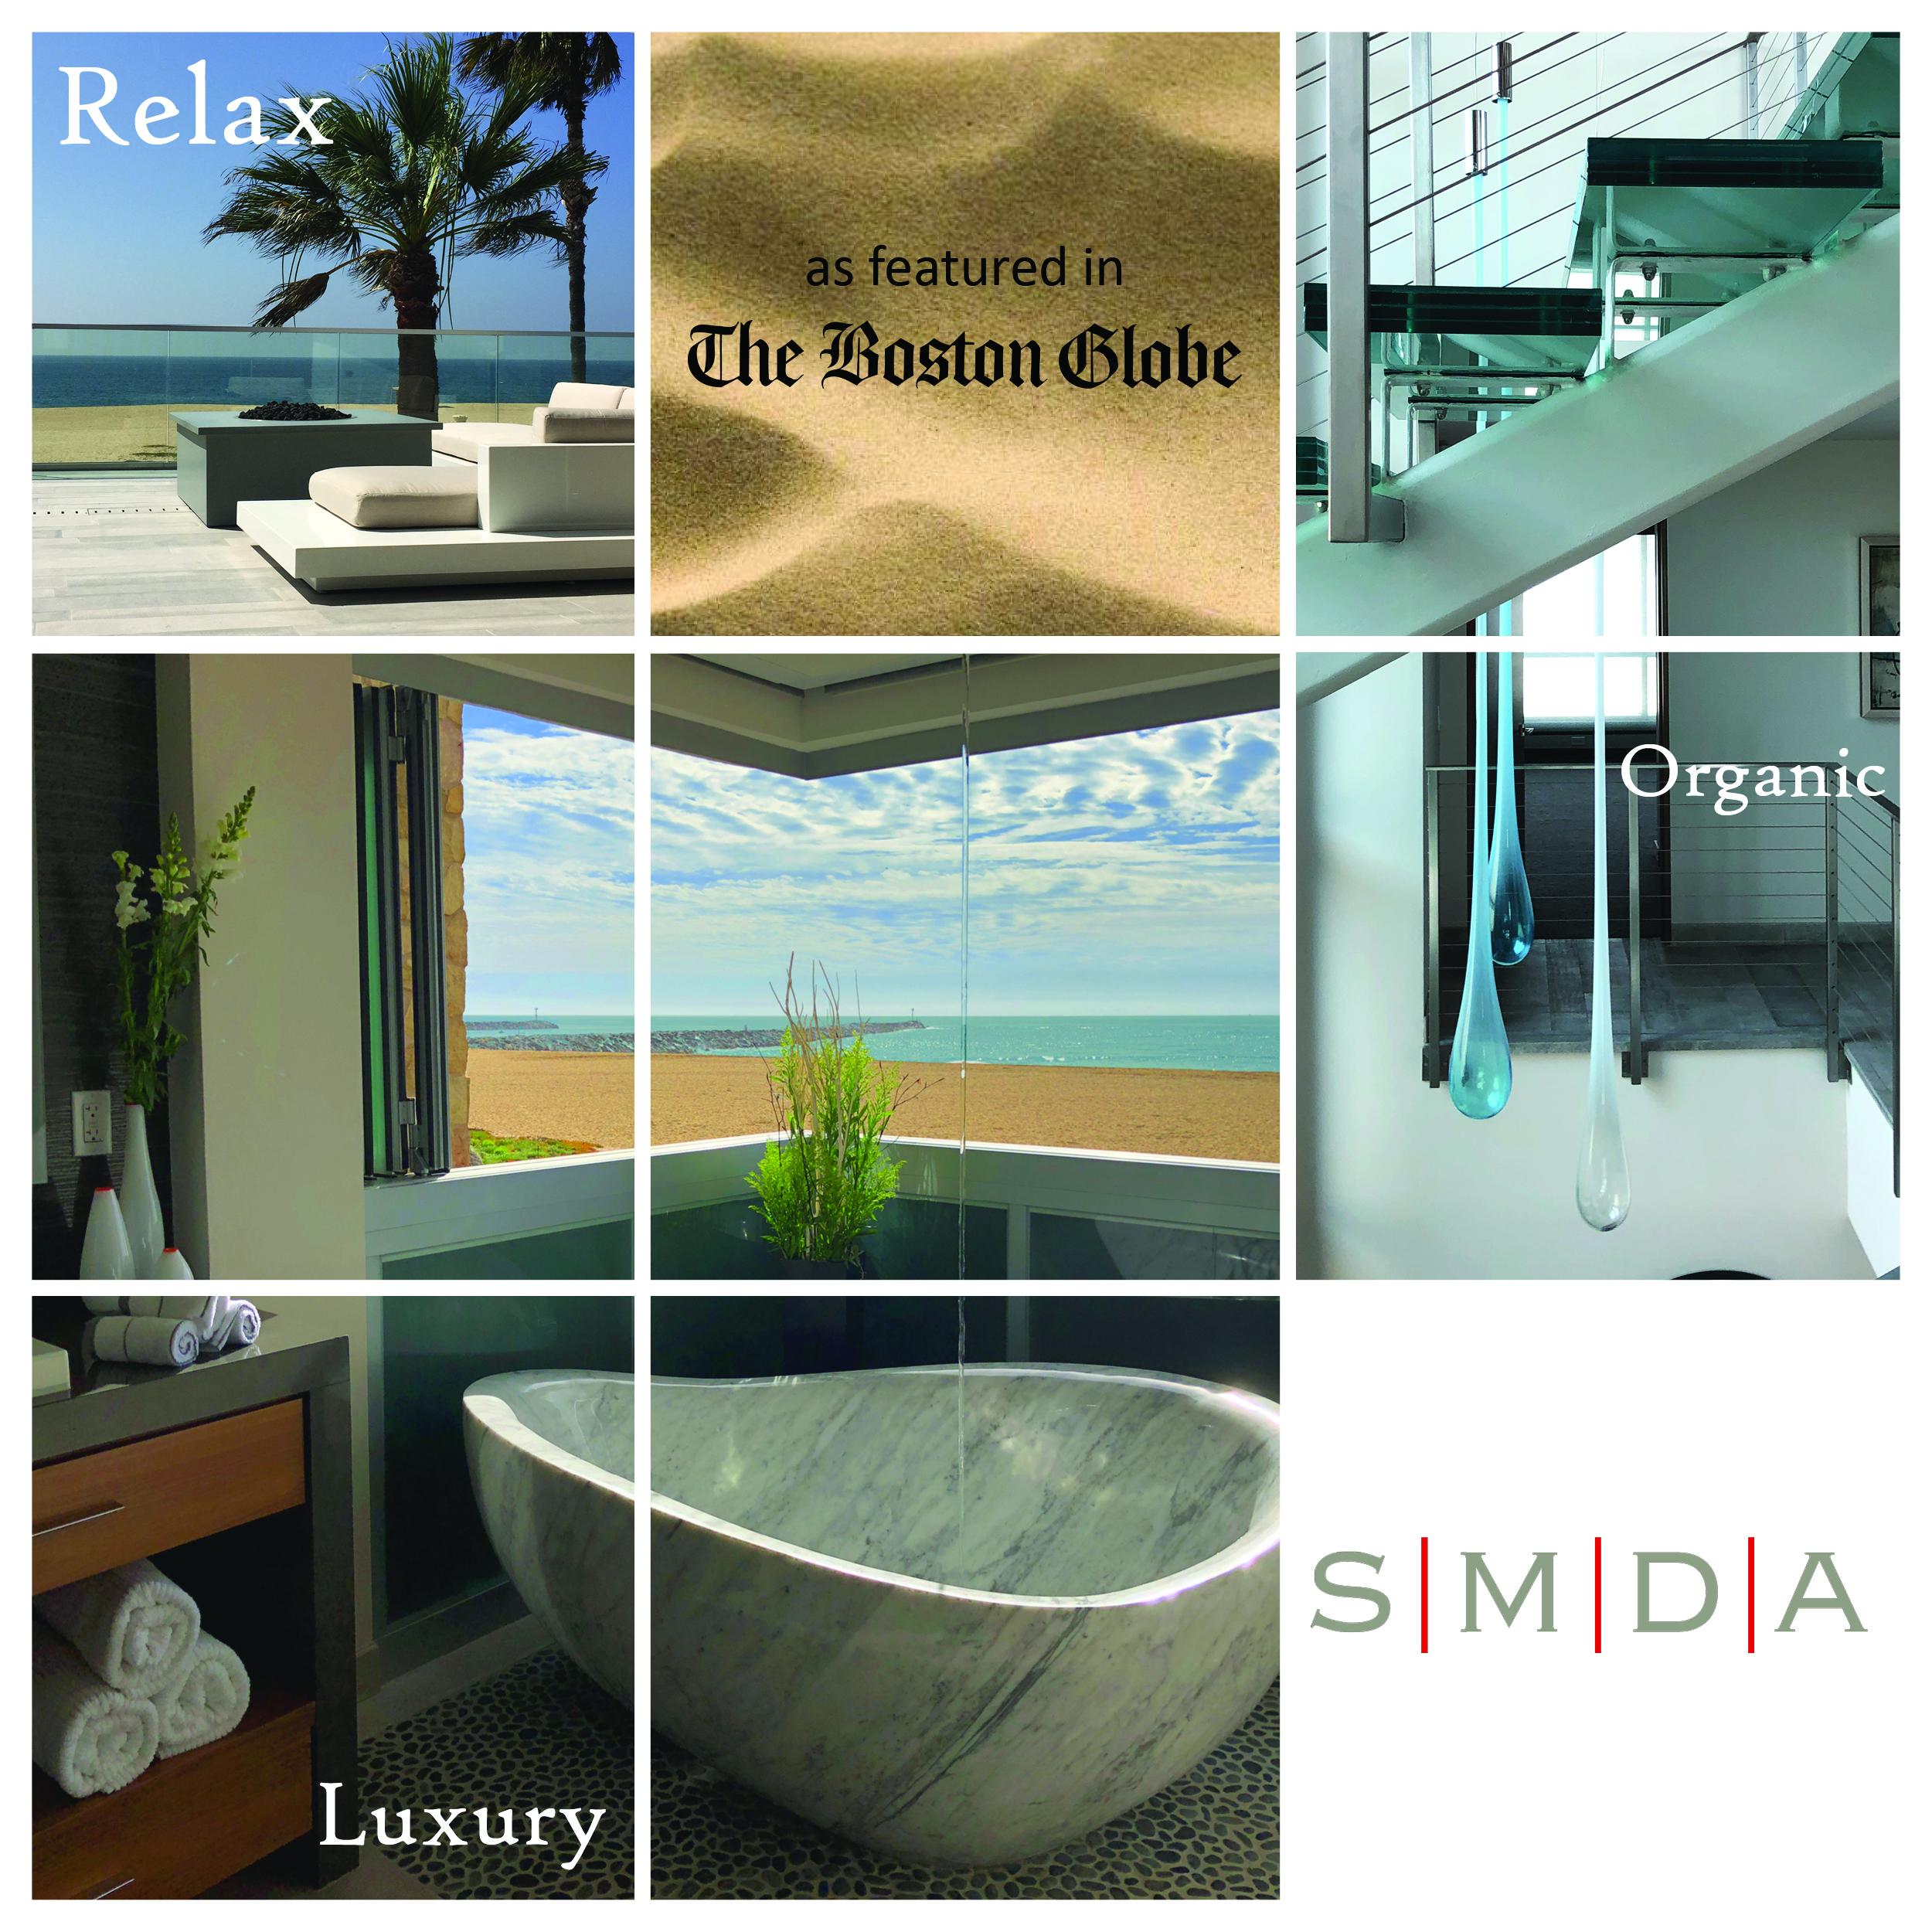 SMDA Newsletter-SoakingTub.jpg